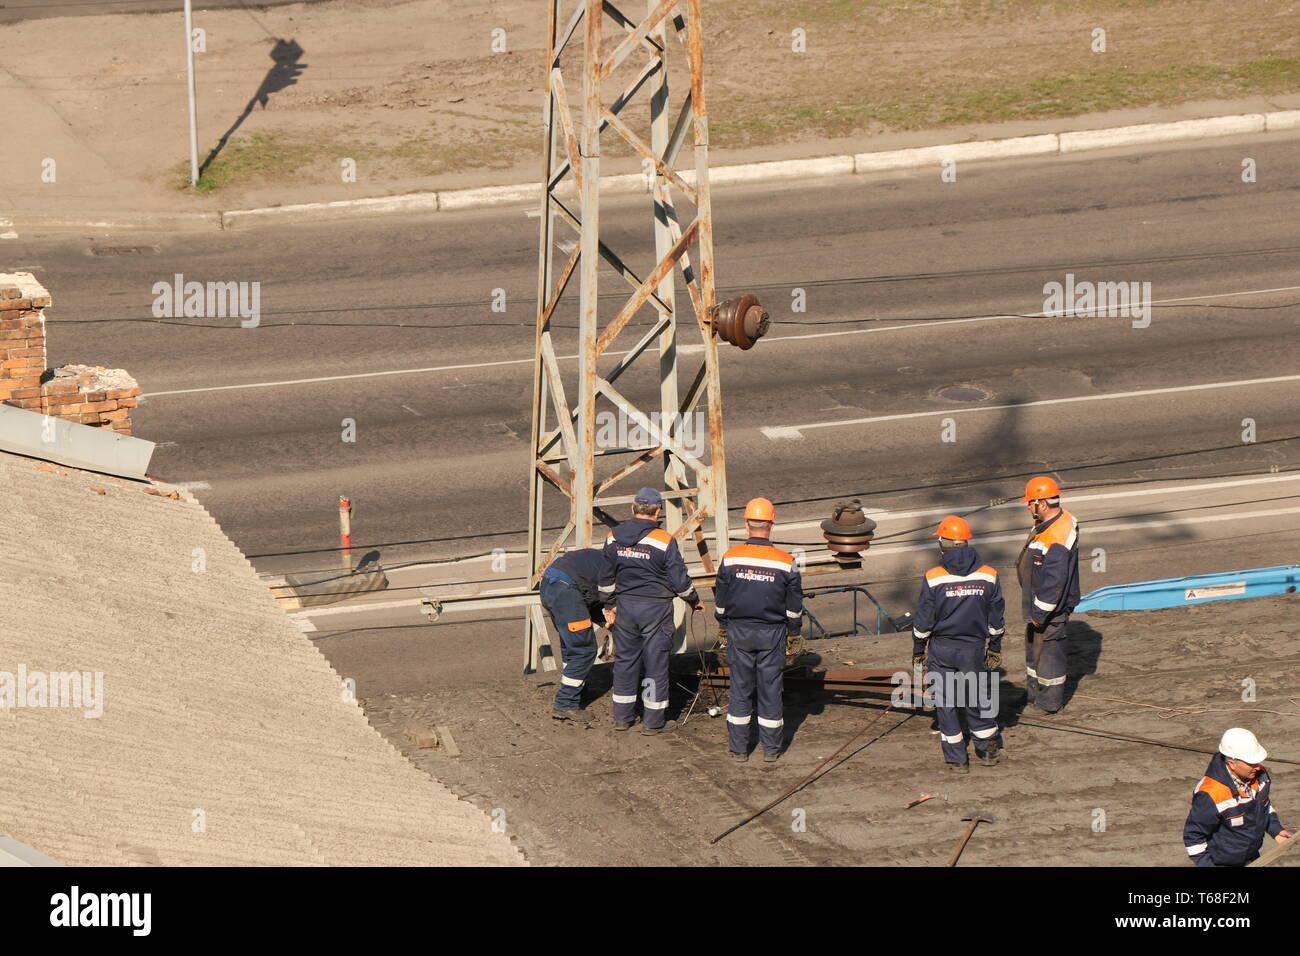 Kremenchug, Poltava region, Ukraine, April 9, 2019, improvement of the city, repair of power grids on the roof of the building Stock Photo